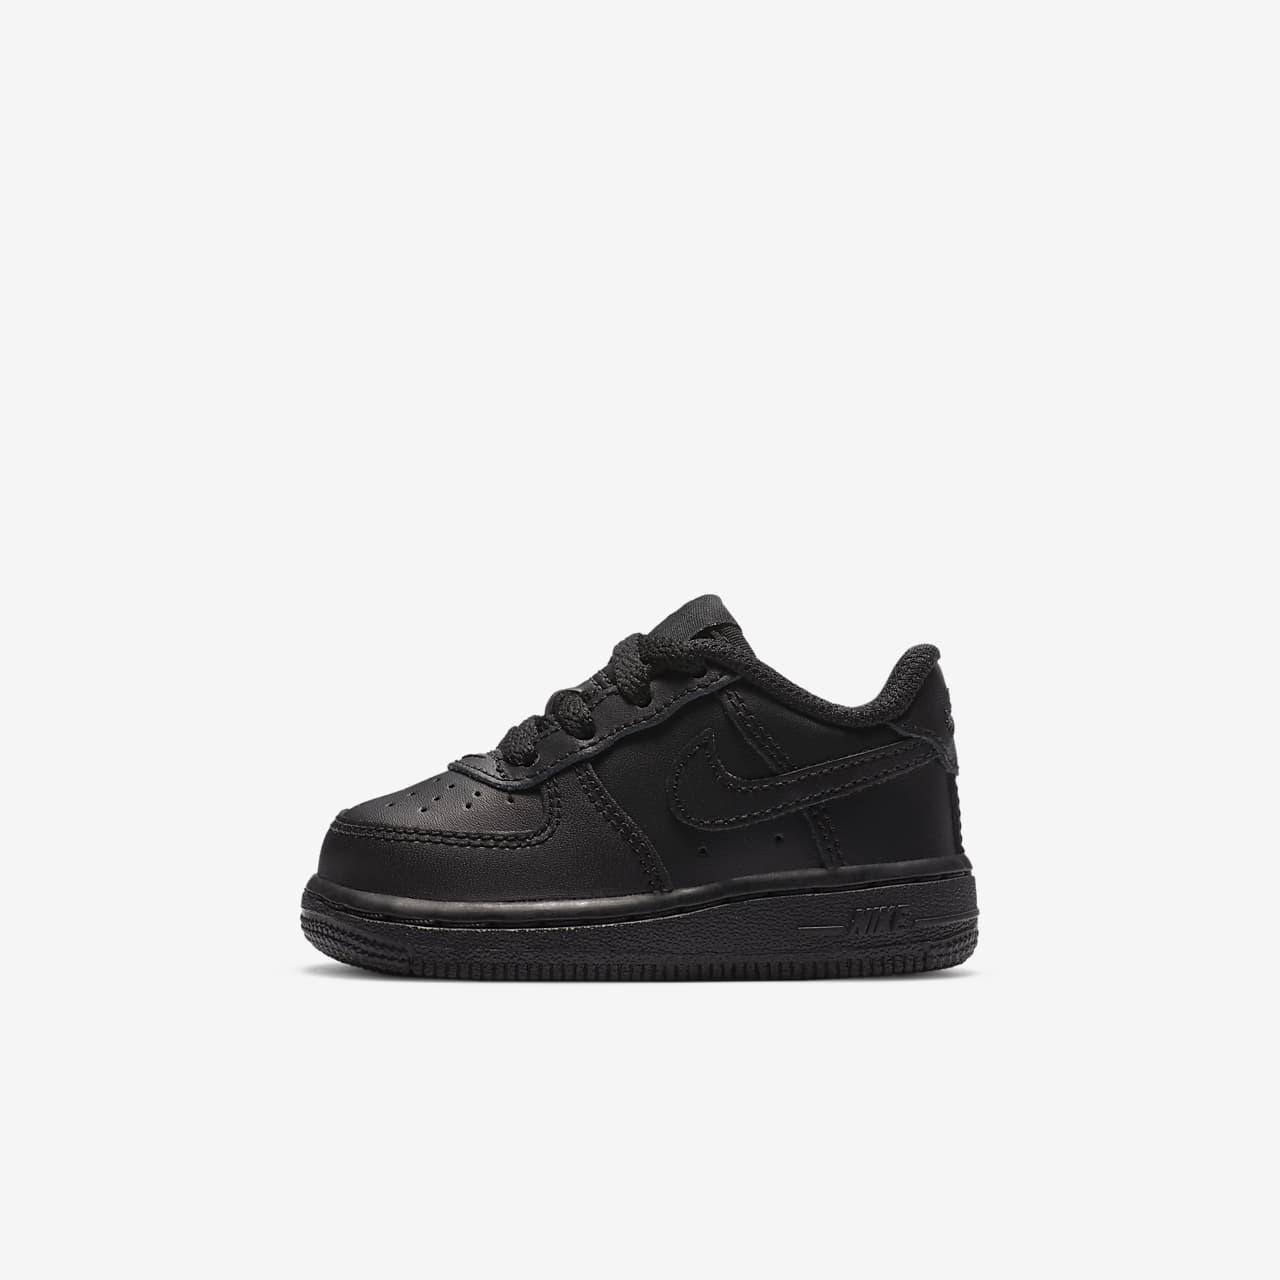 new product c6c9c f2fcd Nike Air Force 1 06 – sko til babyer/småbørn. Nike.com DK